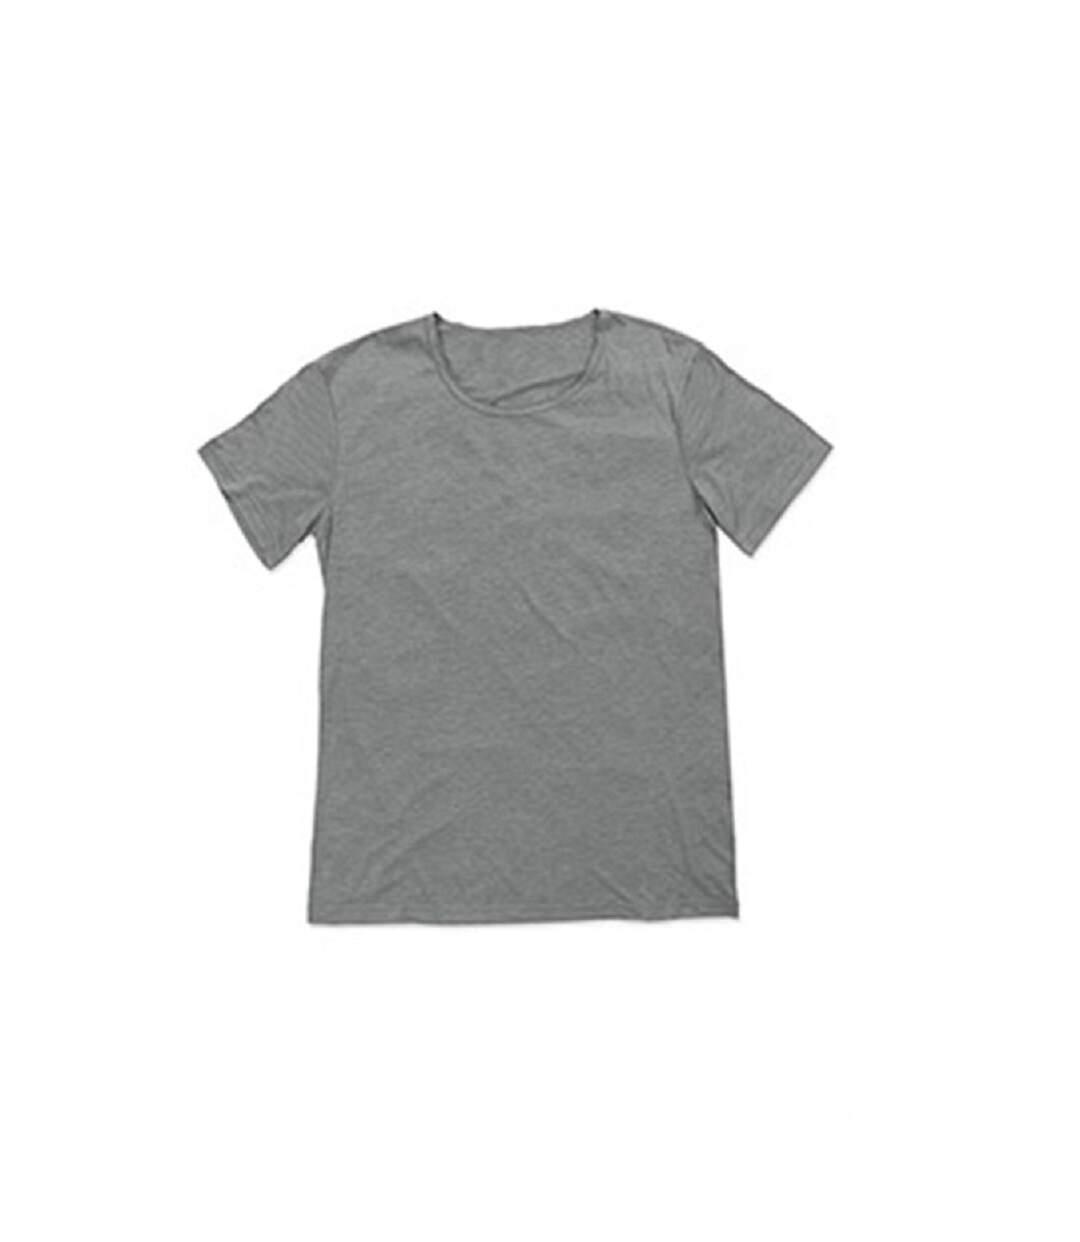 Stedman Mens David Melange Oversized Crew Neck Tee (Vintage Grey) - UTAB395